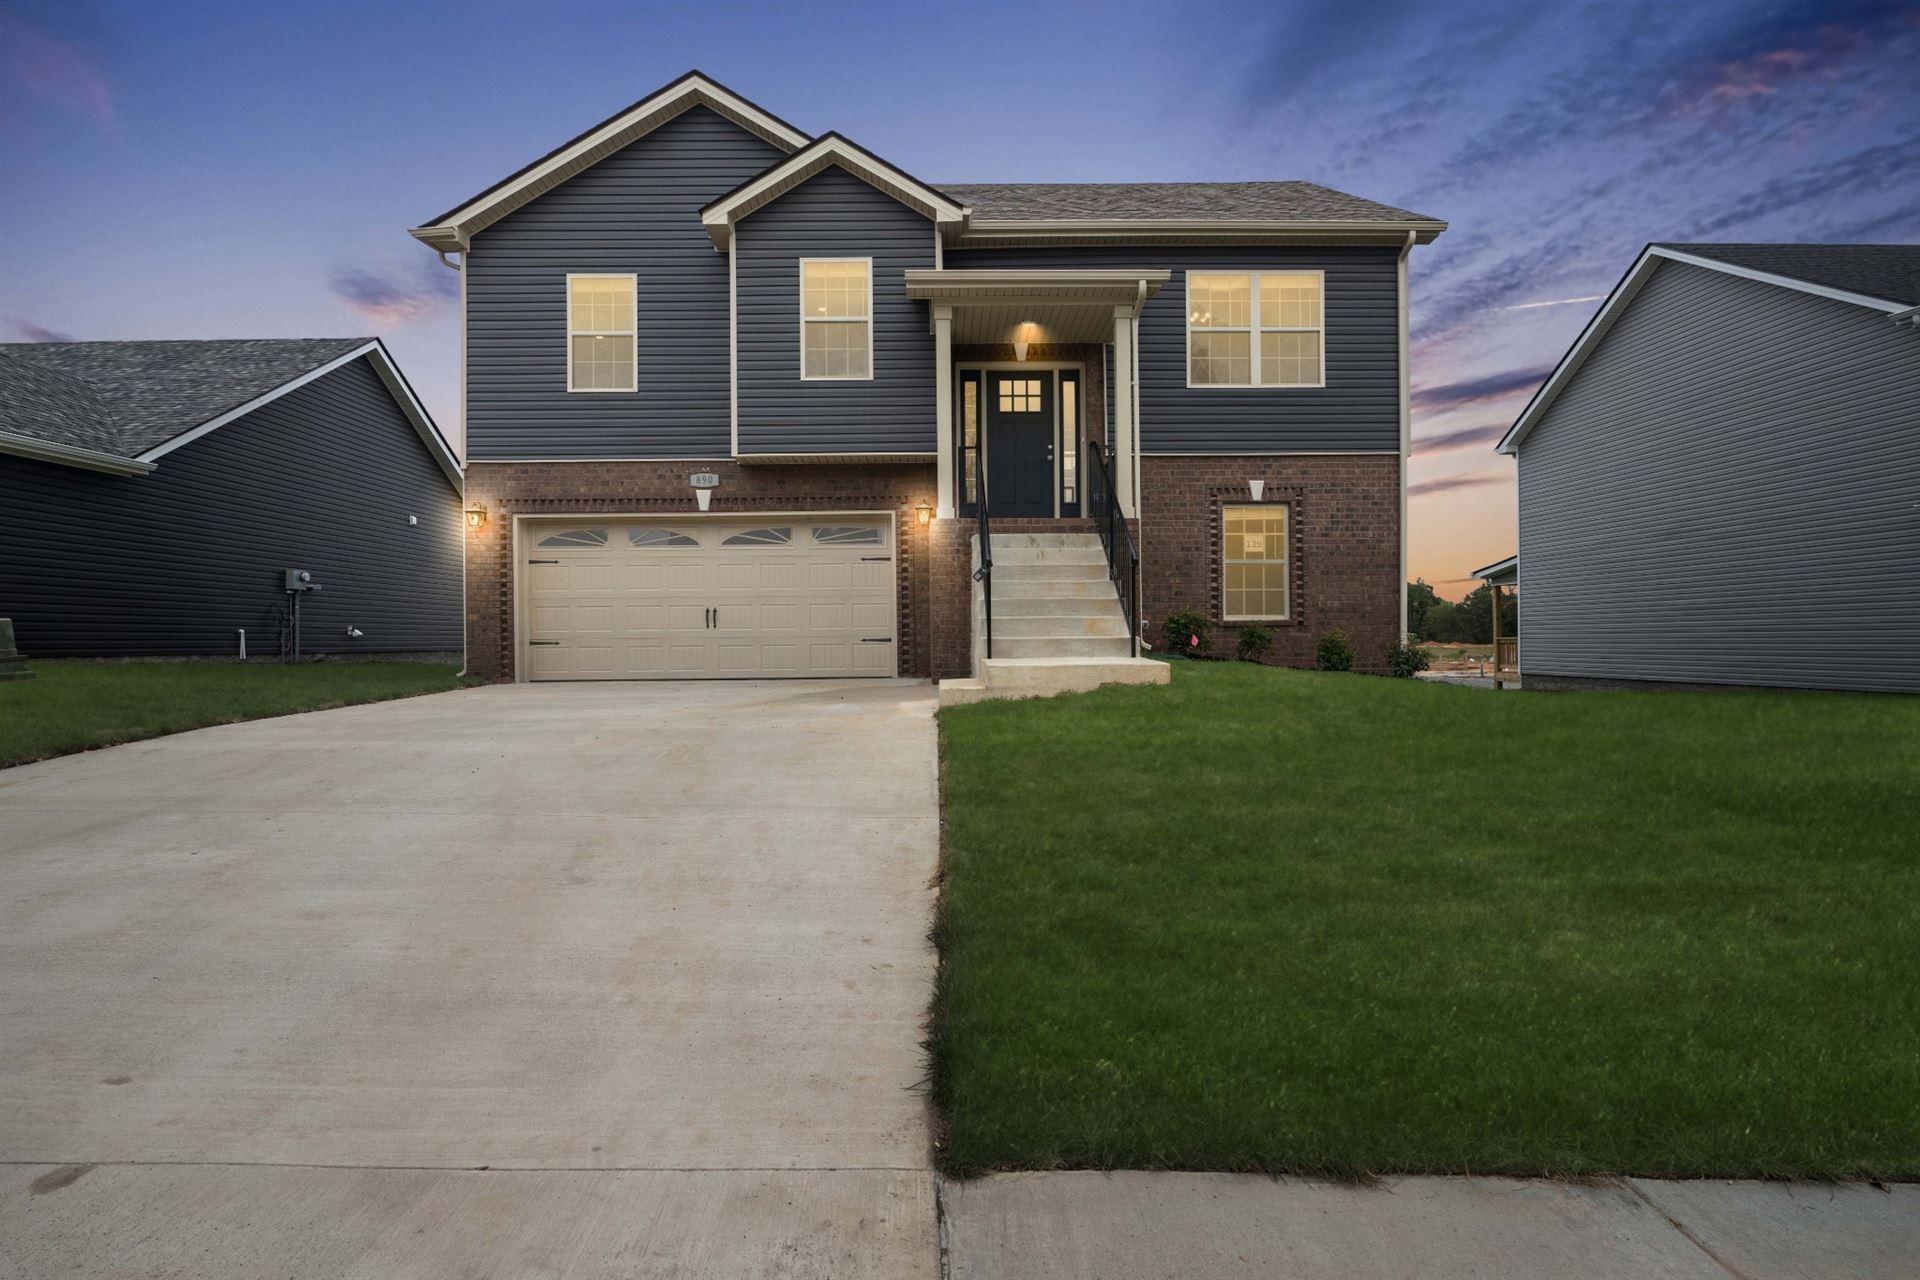 139 Irish Hills, Clarksville, TN 37042 - MLS#: 2264573